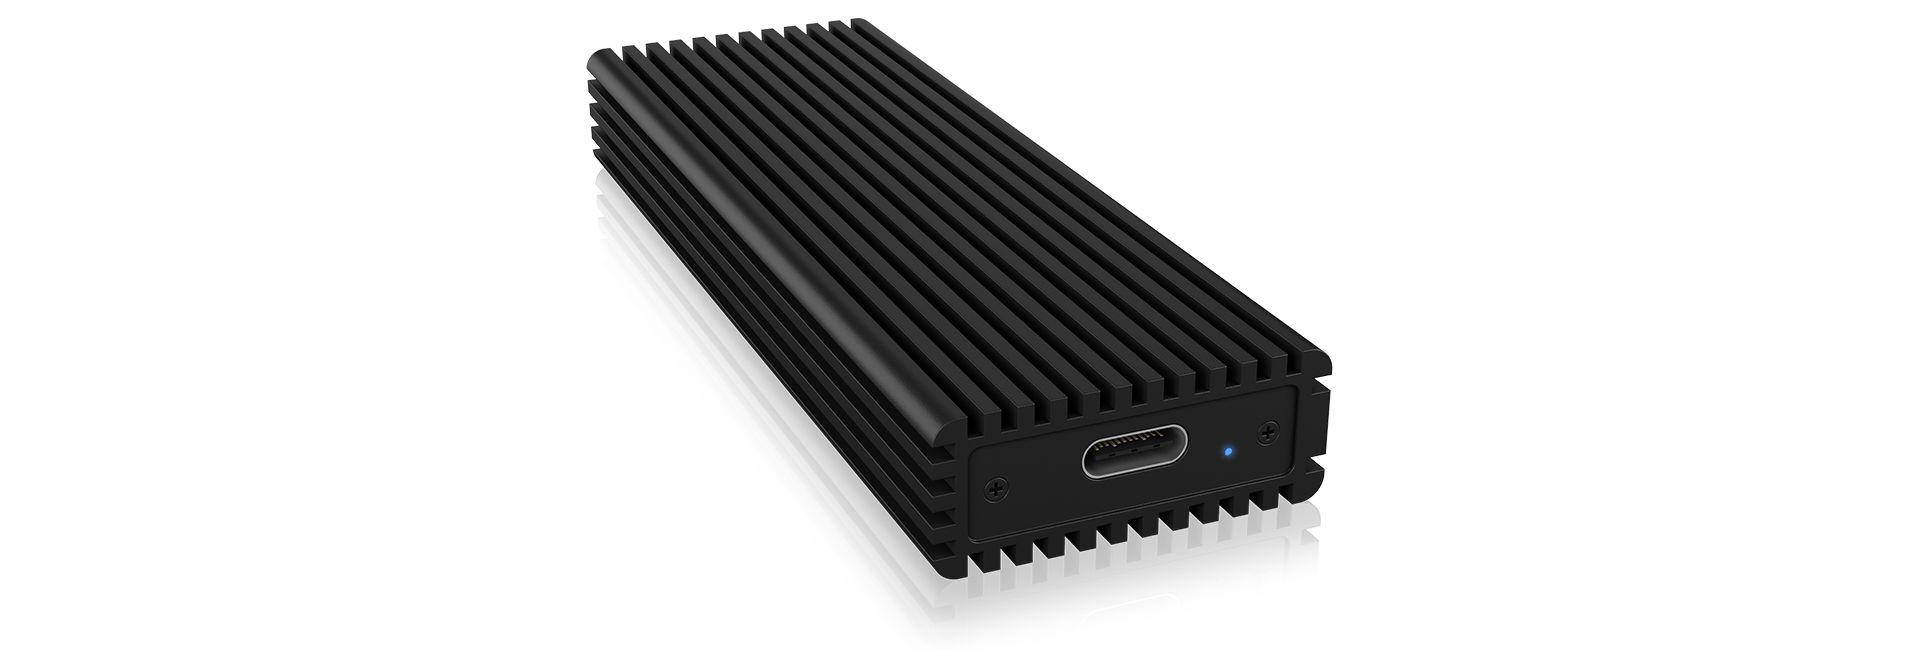 Raidsonic IcyBox IB-1816M-C31 External Type-C enclosure for M.2 NVMe SSD (IB-1816M-C31)